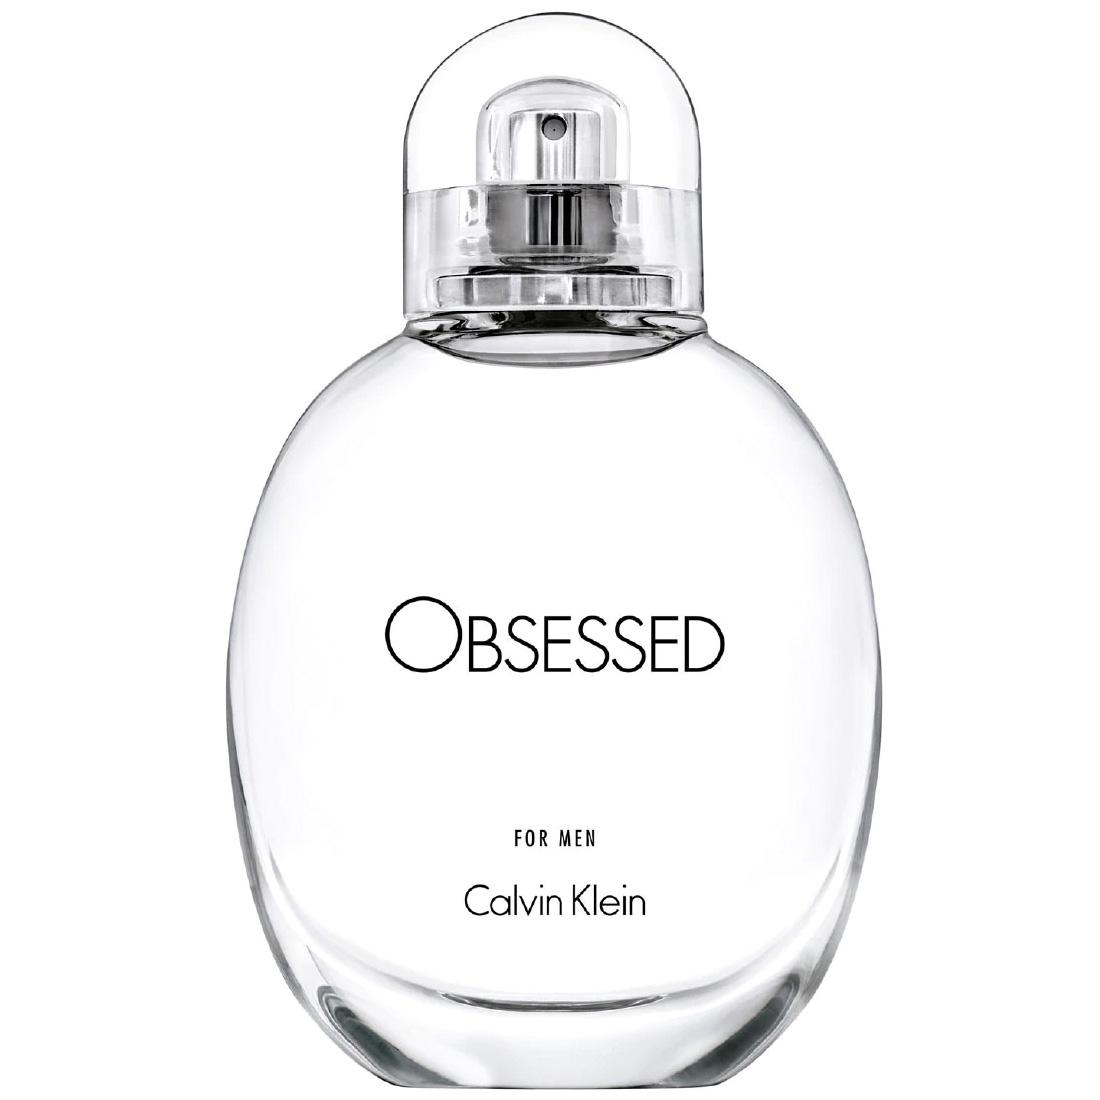 Calvin Klein - Obsessed for Men - Eau de Toilette